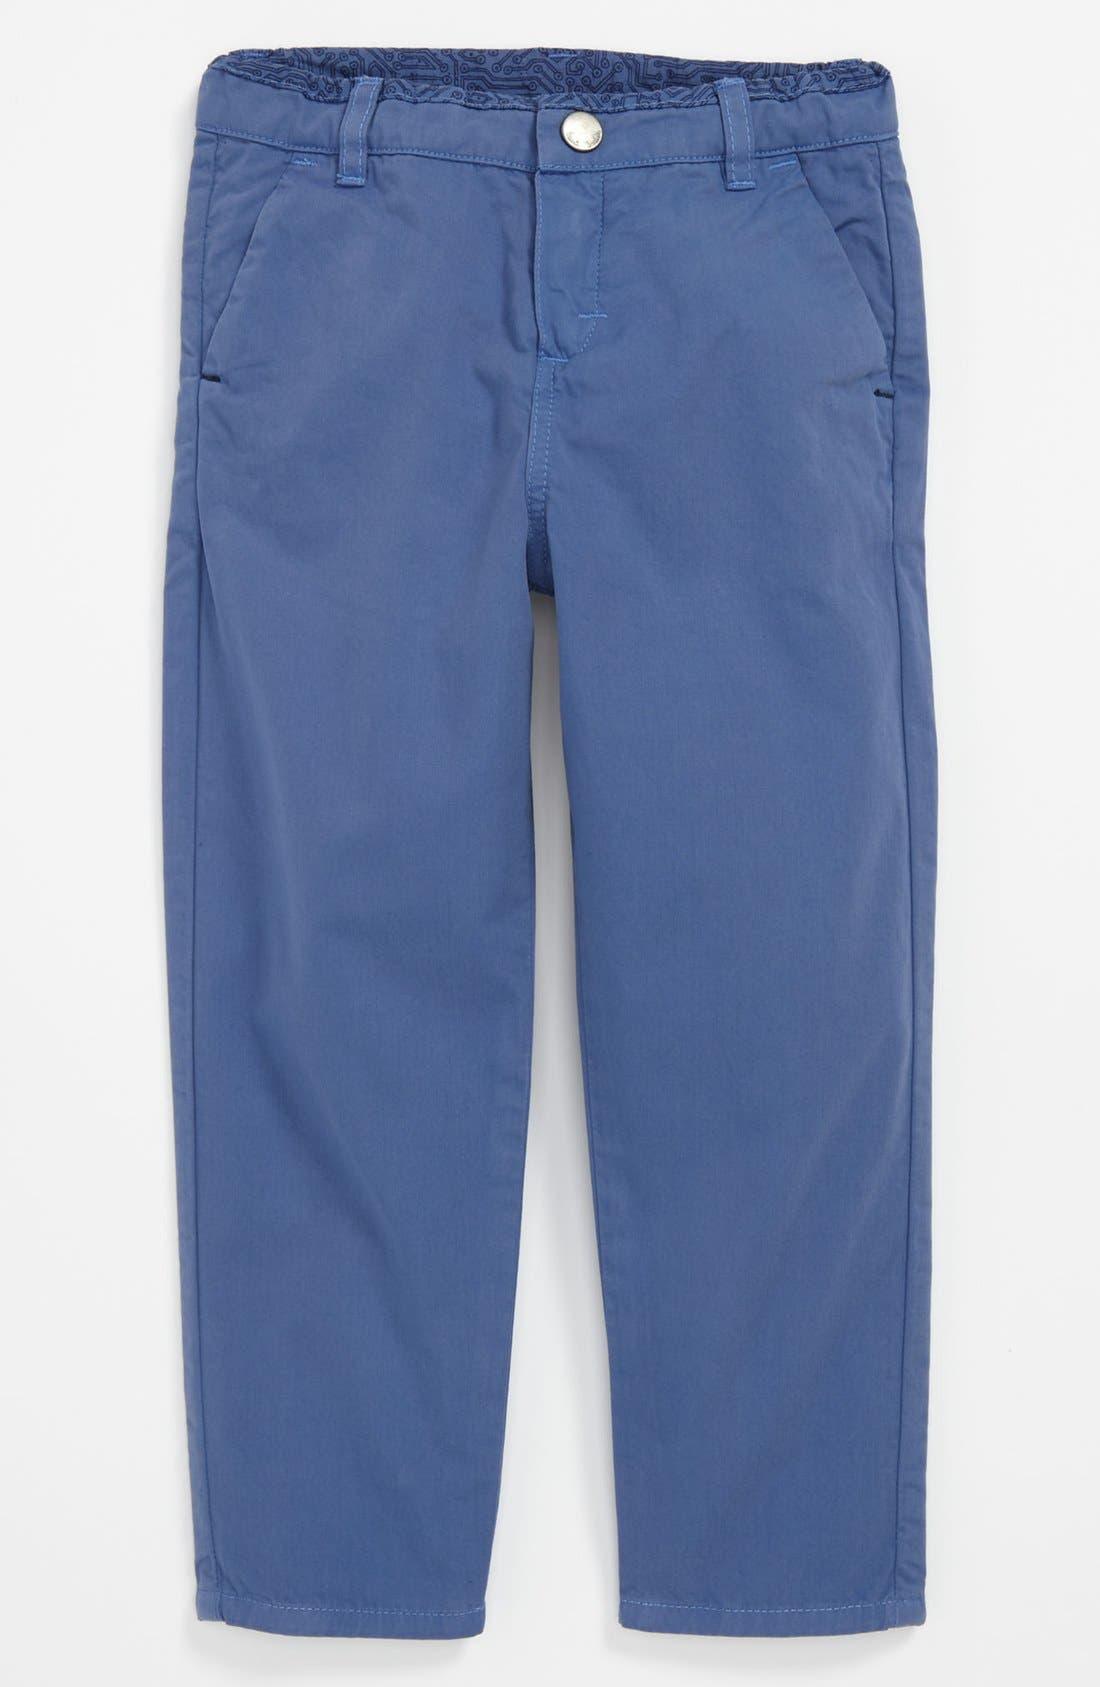 Alternate Image 2  - Paul Smith Junior Denim Pants (Toddler)